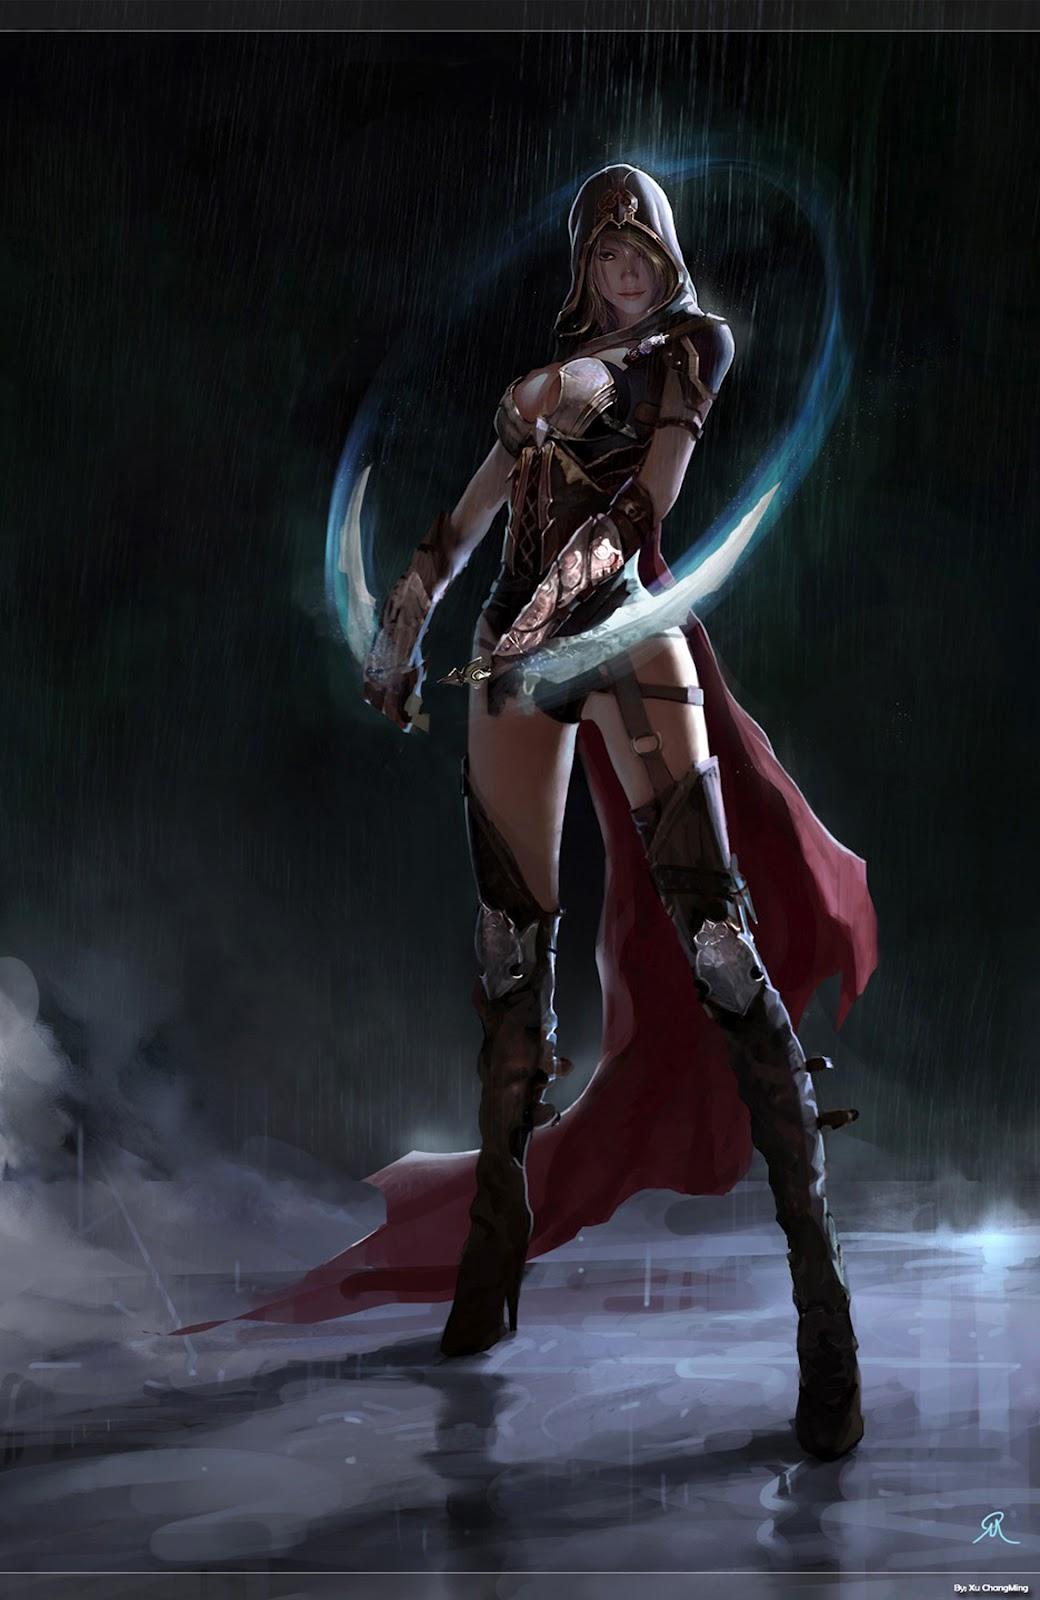 Assassins creed nackt sex image